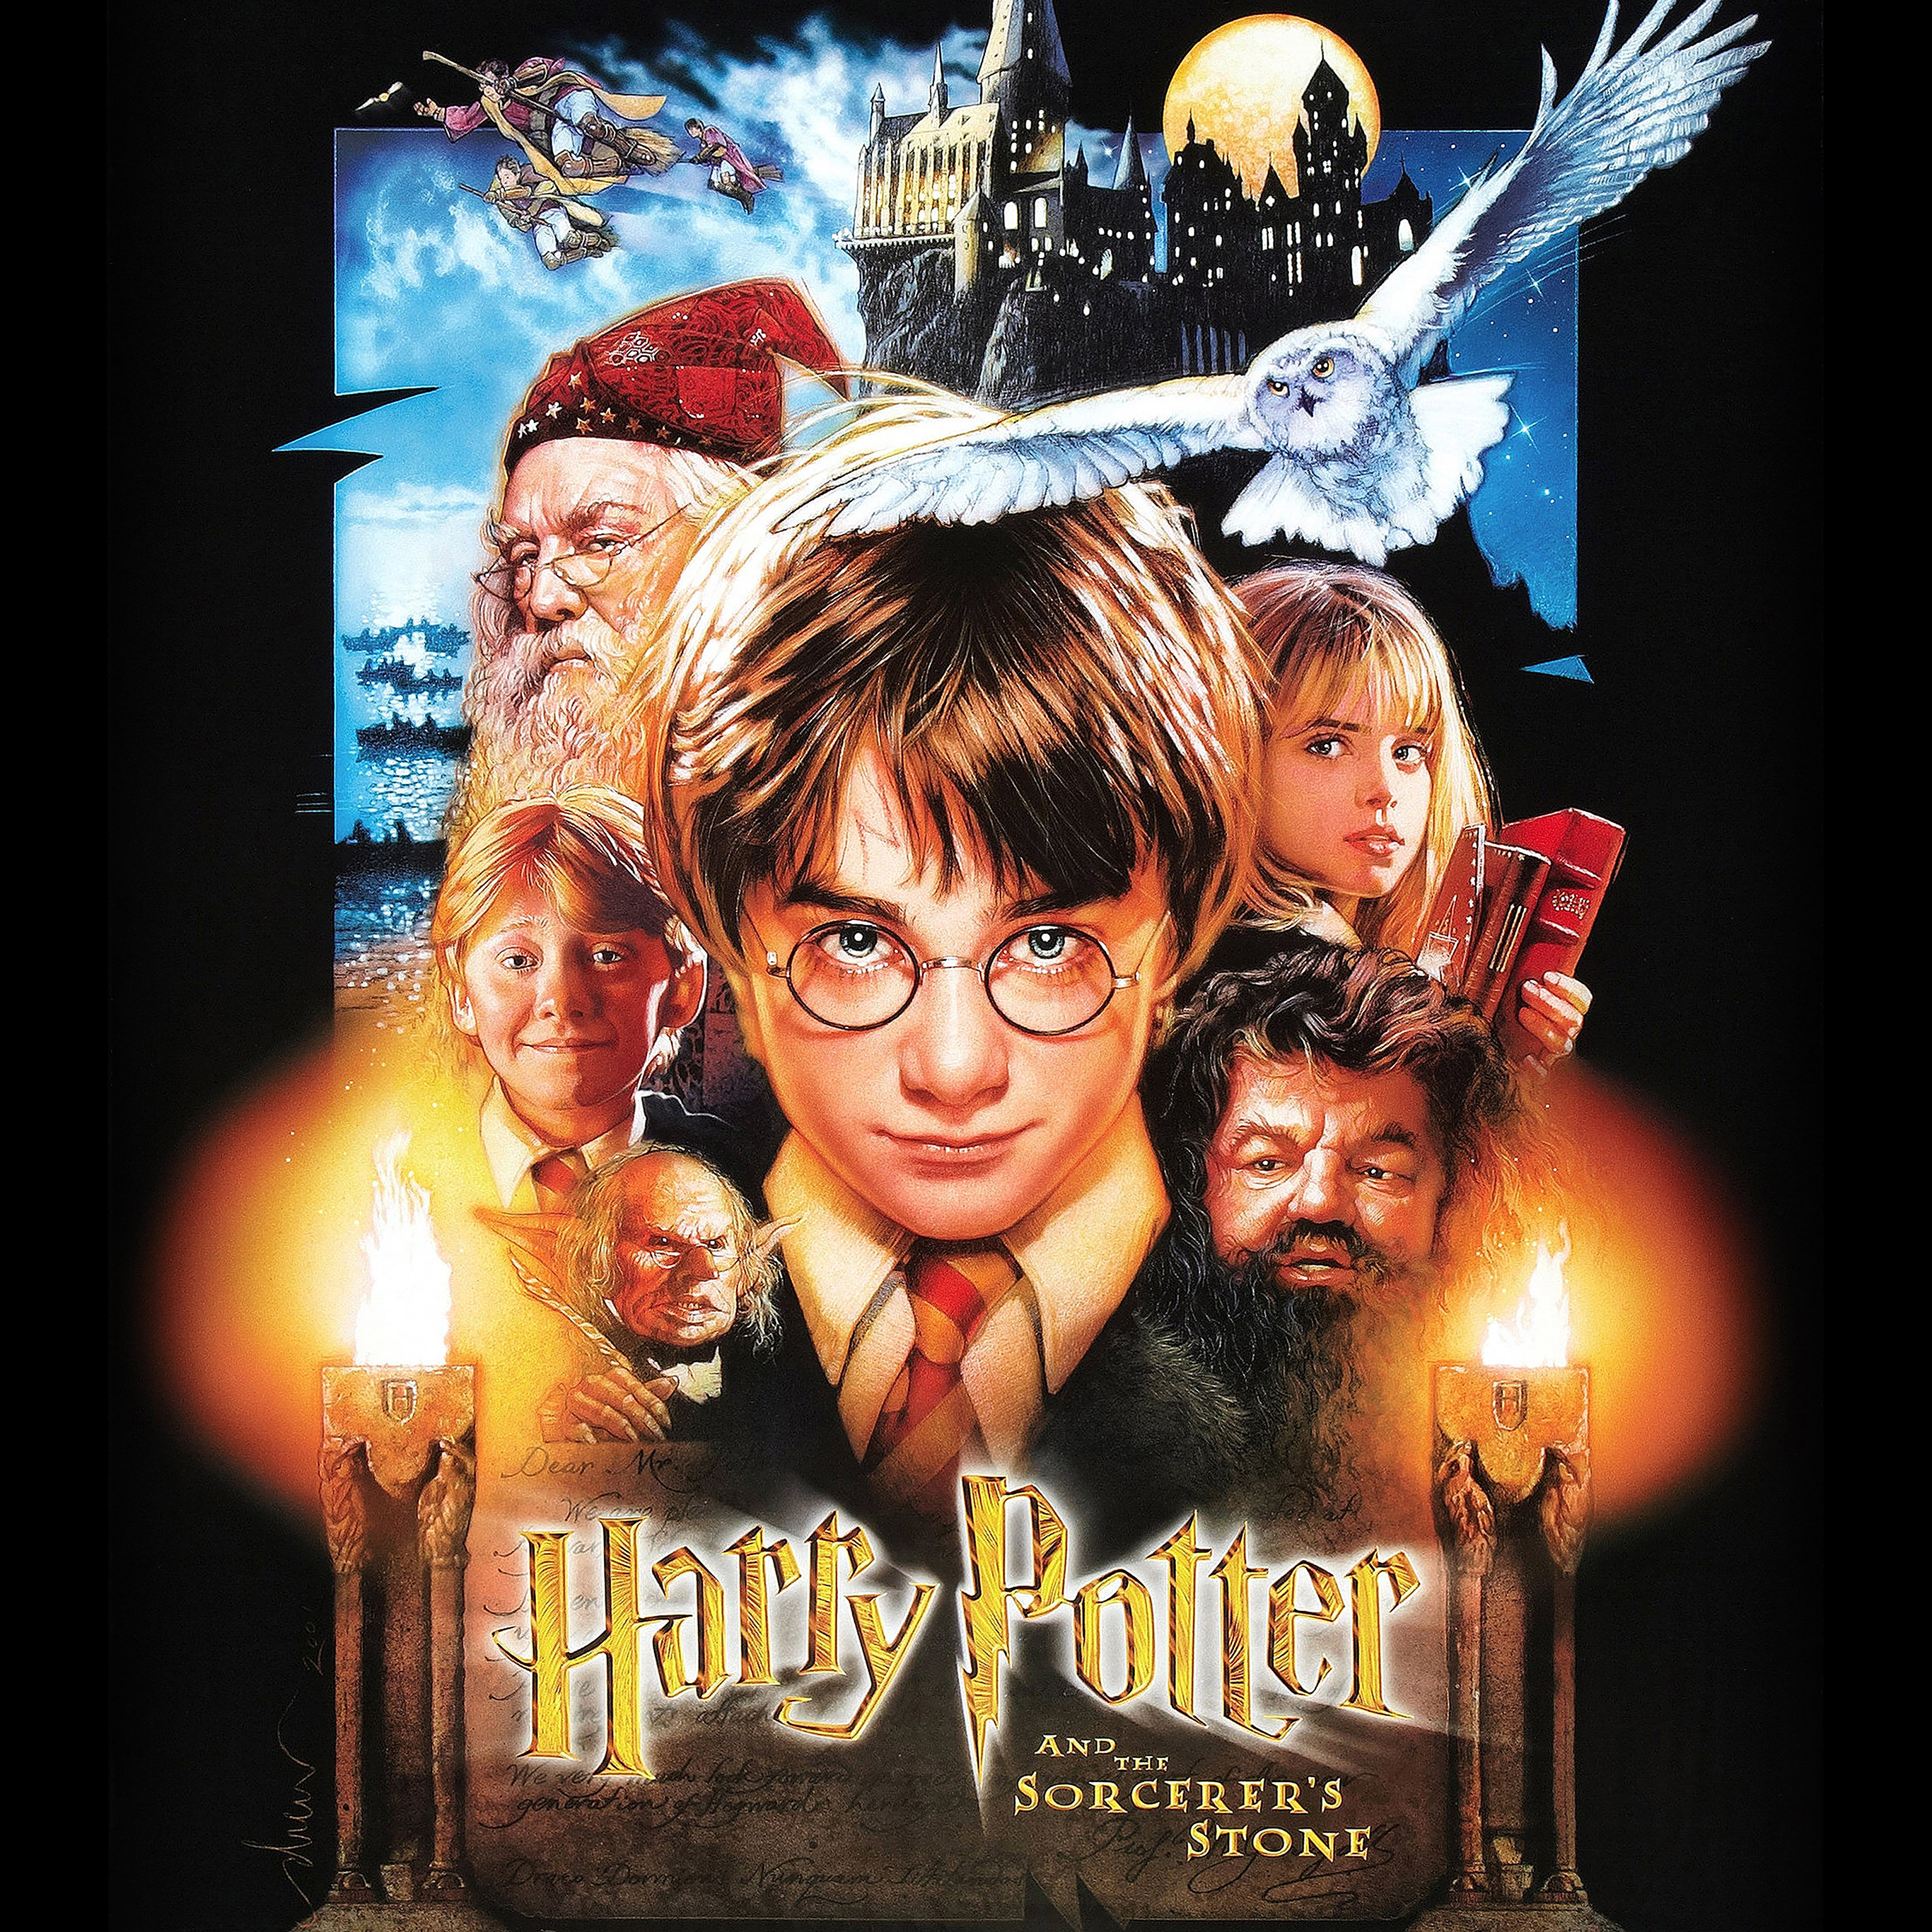 Amazing Wallpaper Harry Potter Ipad - papers  Image_246371.jpg